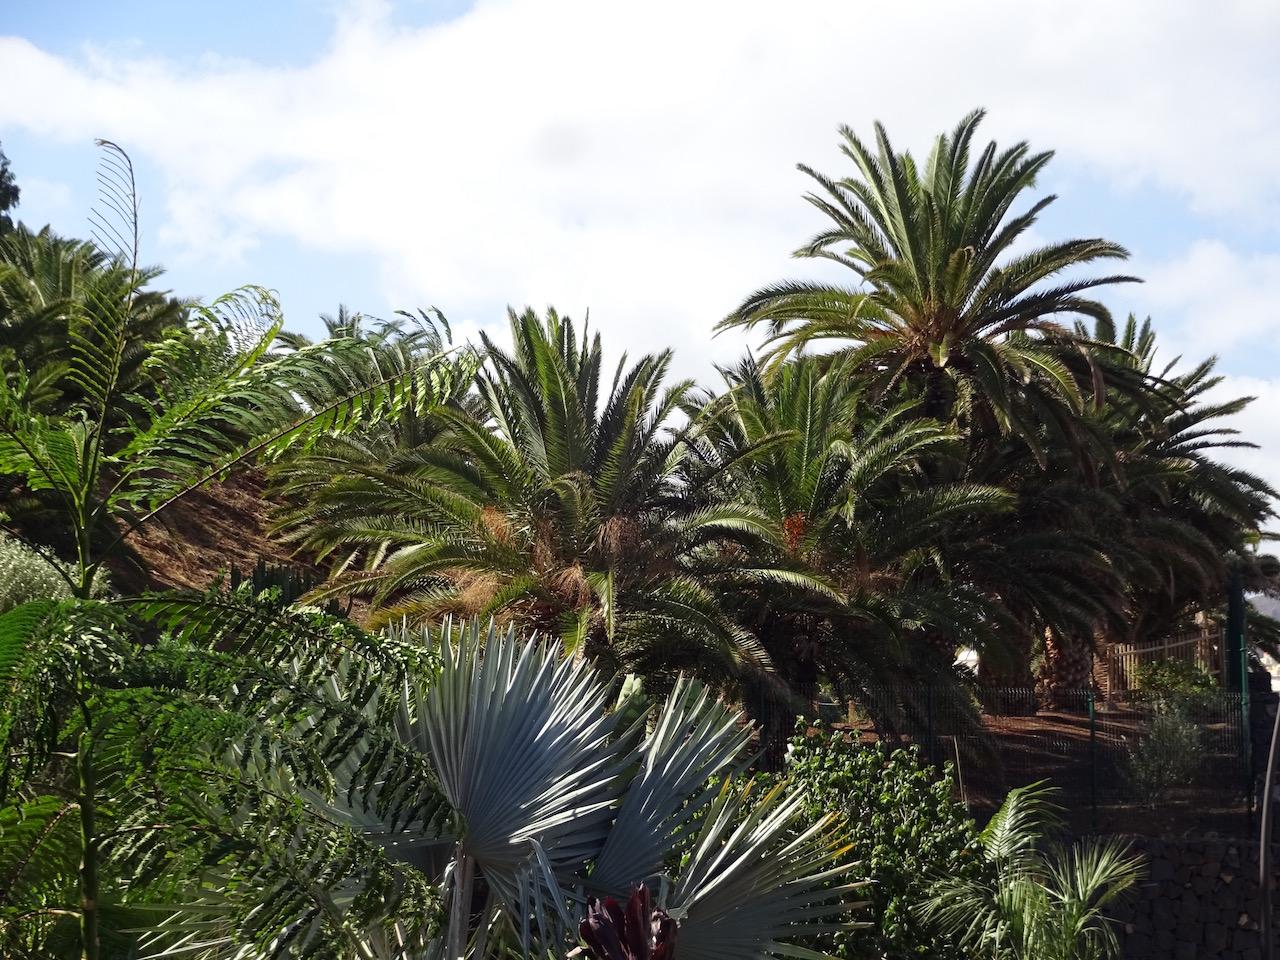 Blick auf den Palmengarten